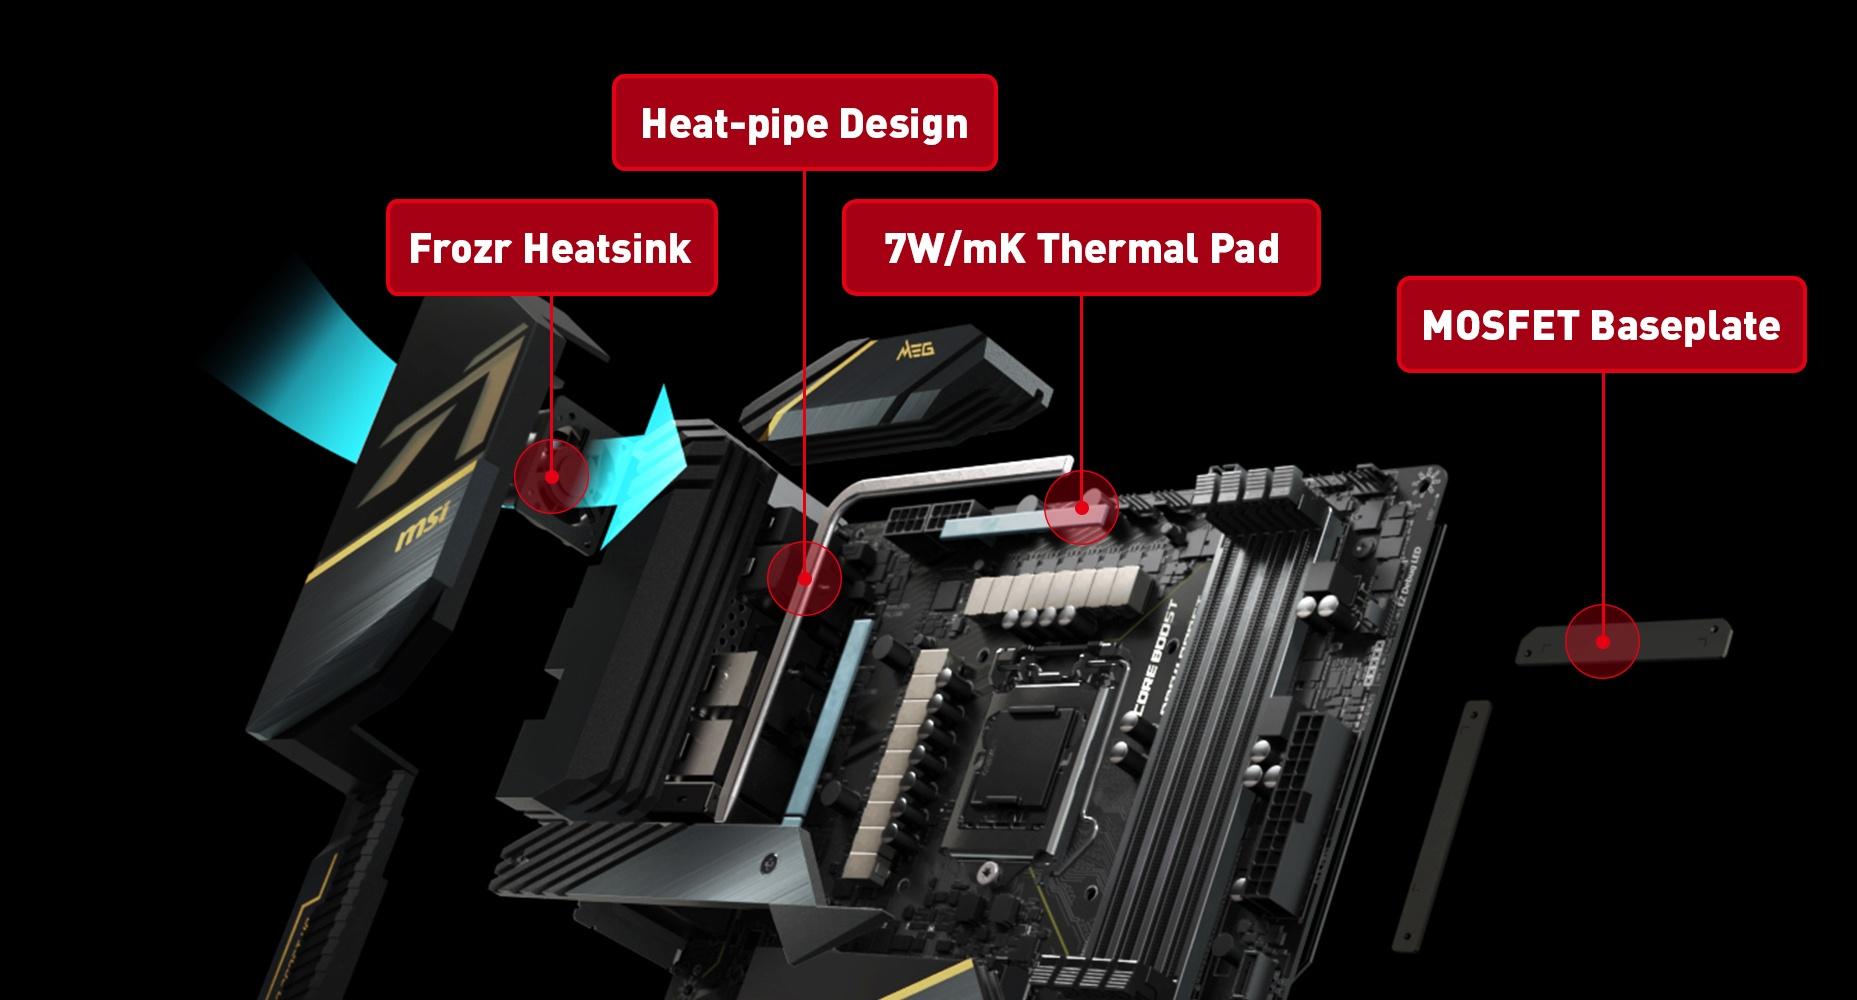 MSI MEG Z490 ACE THERMAL SOLUTION